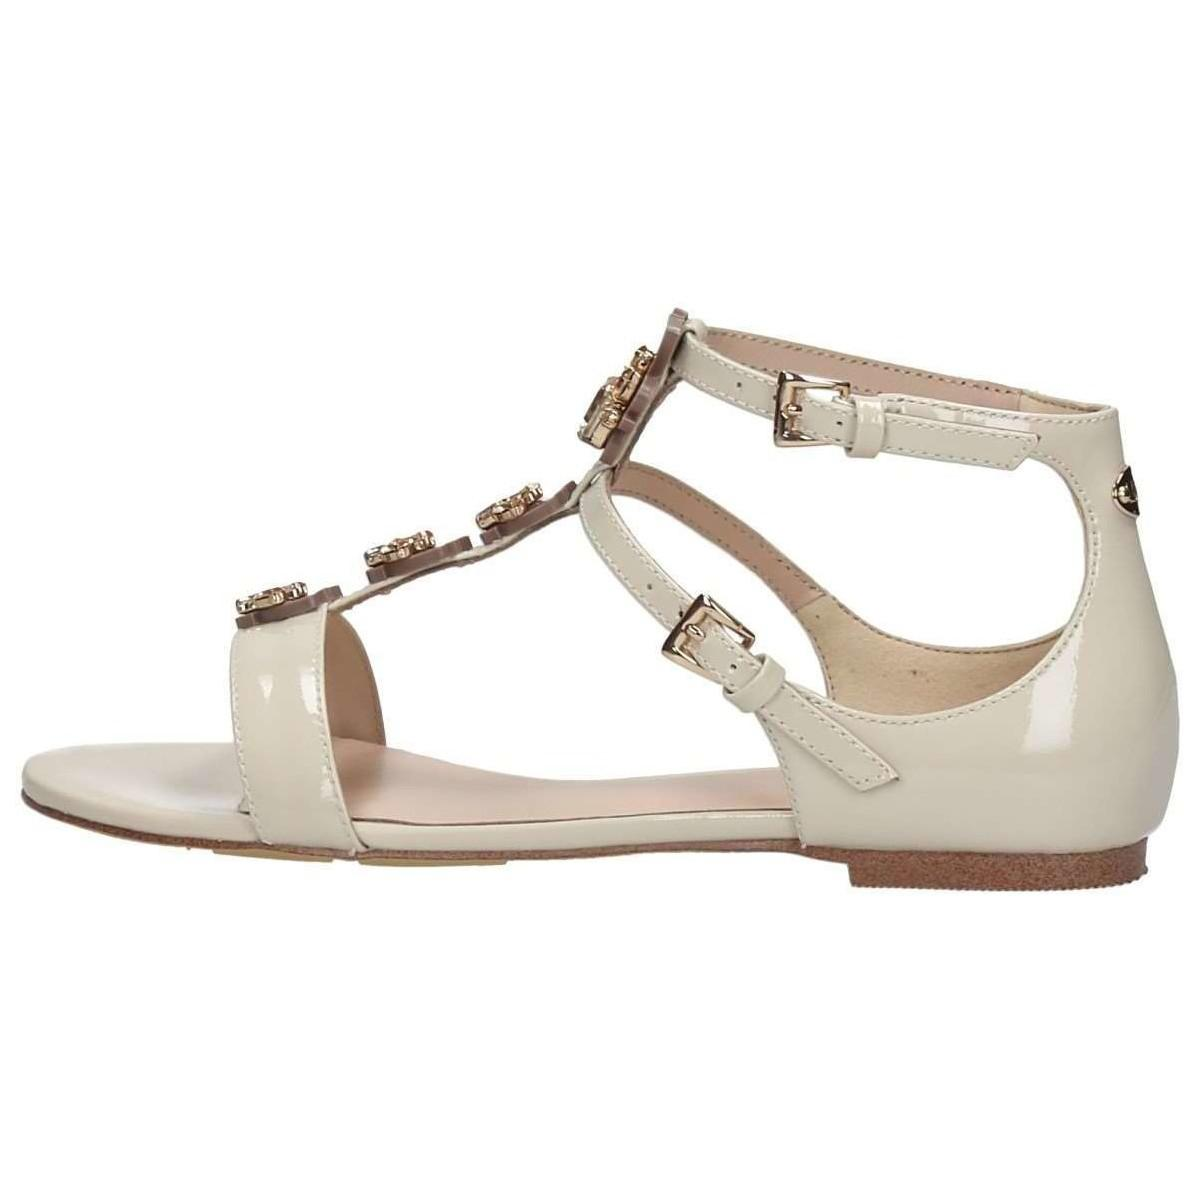 Liu Jo S17021p0283 Sandals natural Women